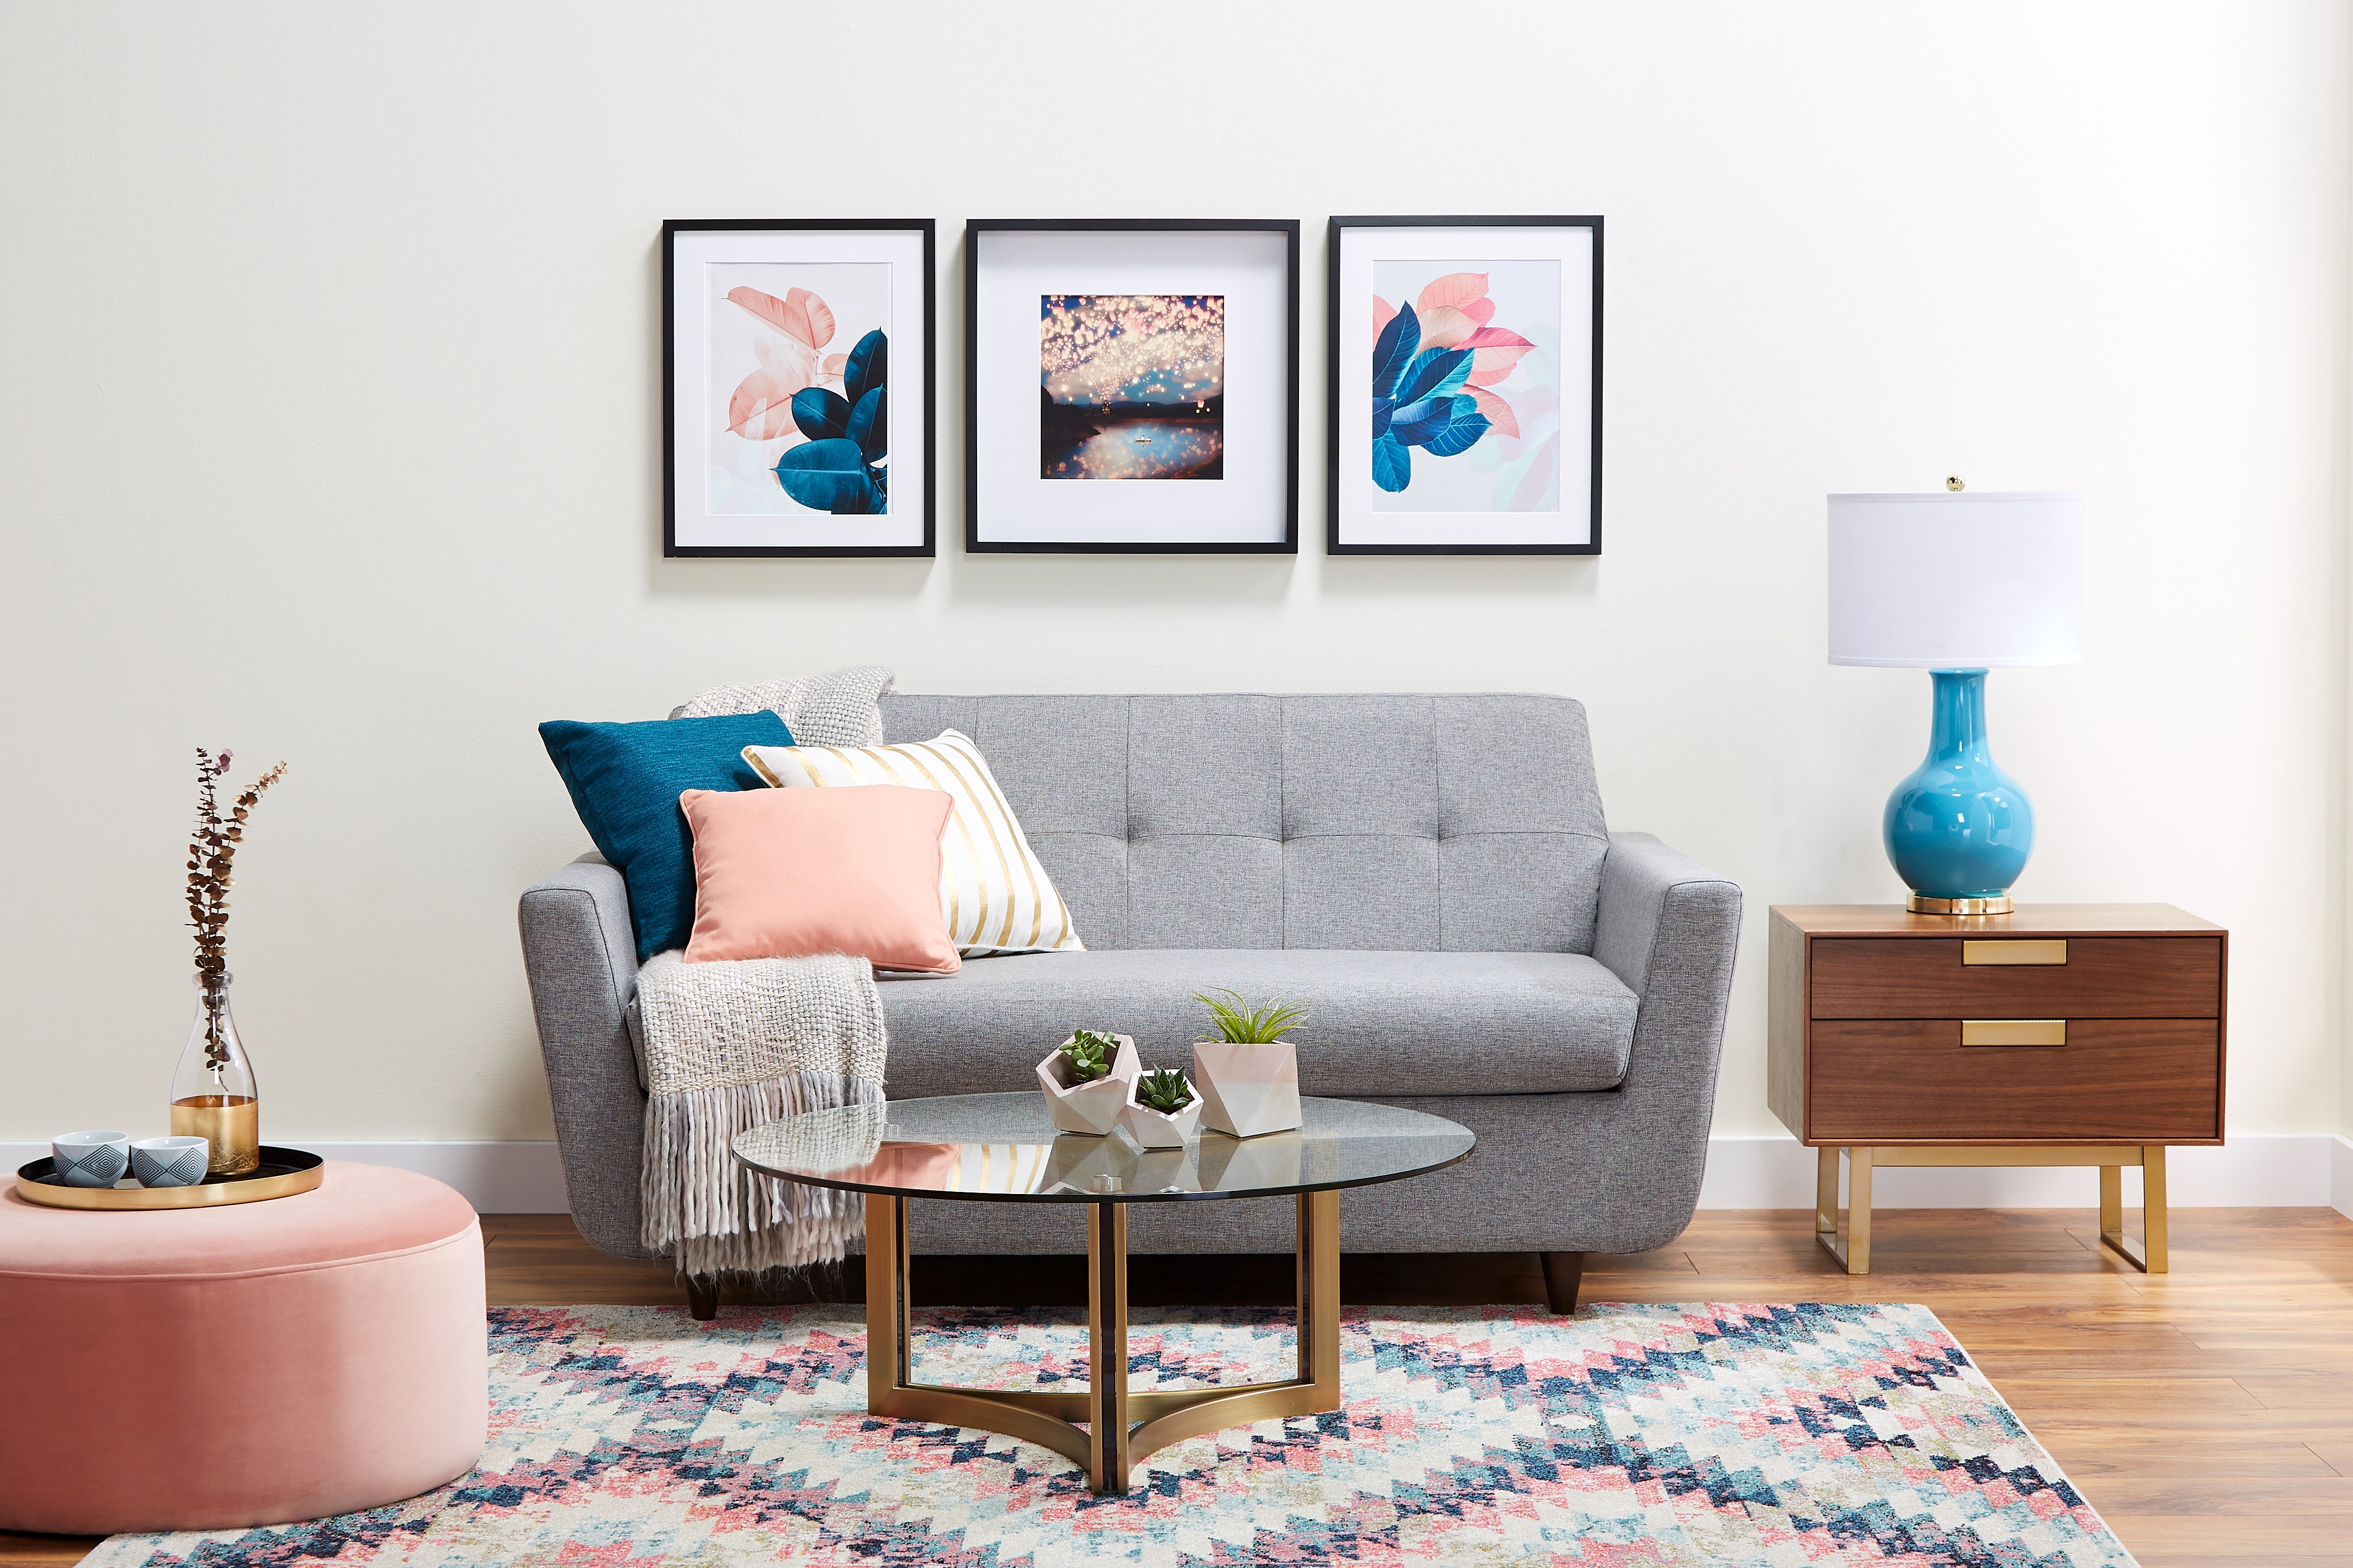 twin chair sleeper sofa white fir barber hughes joybird main gallery image